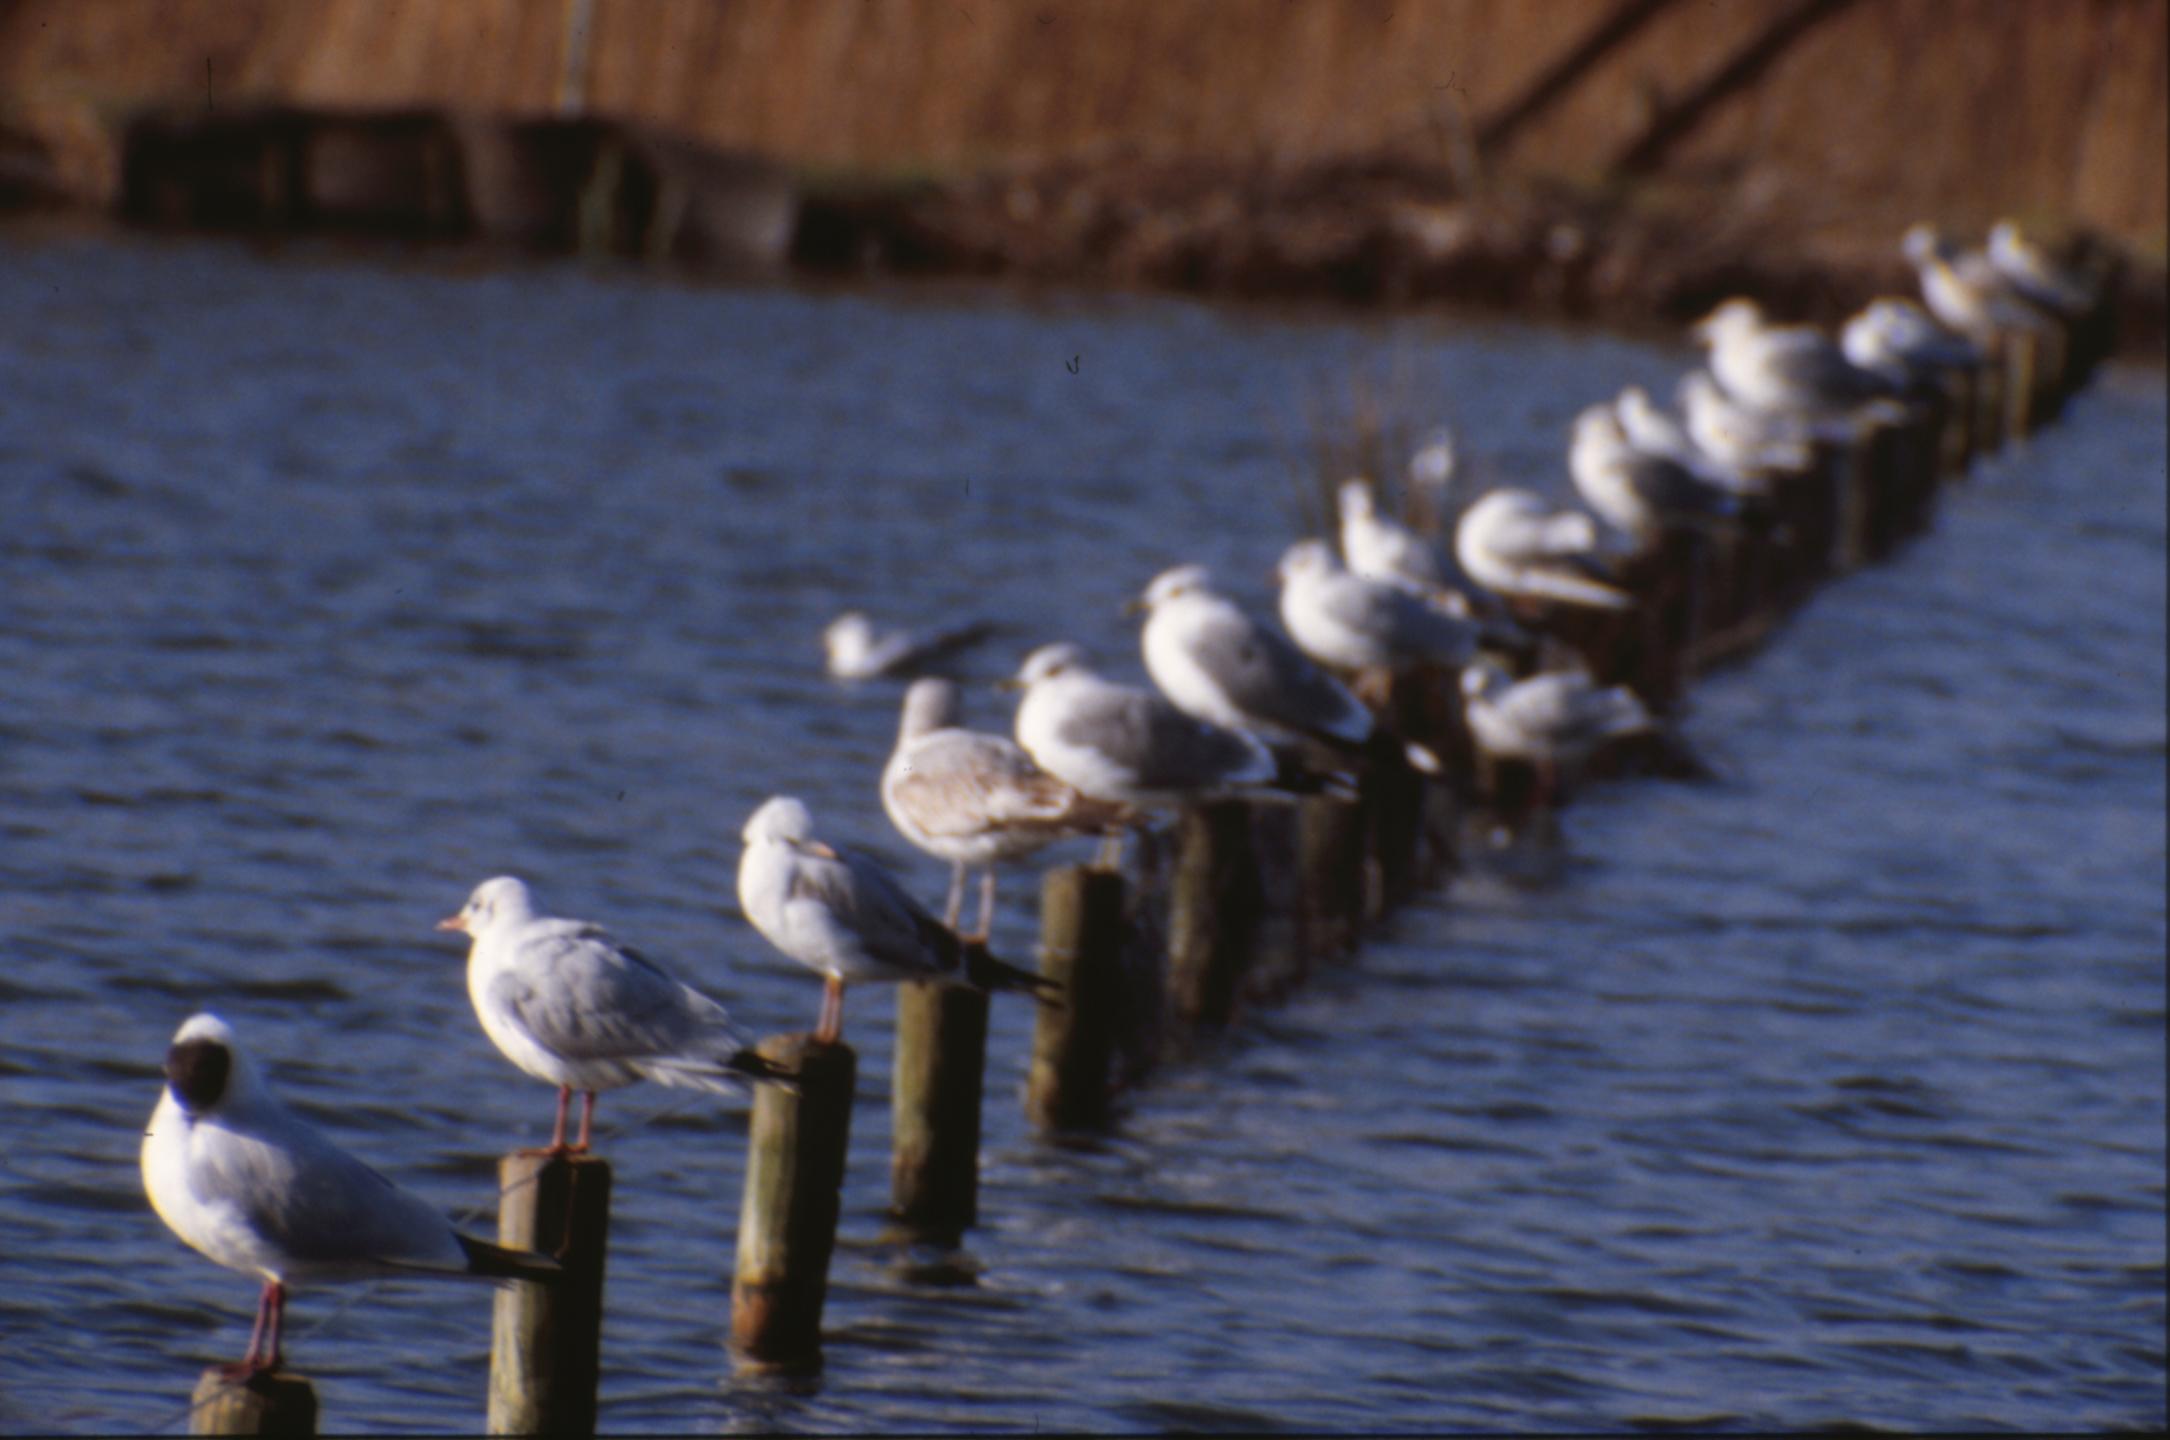 Line of seagulls photo